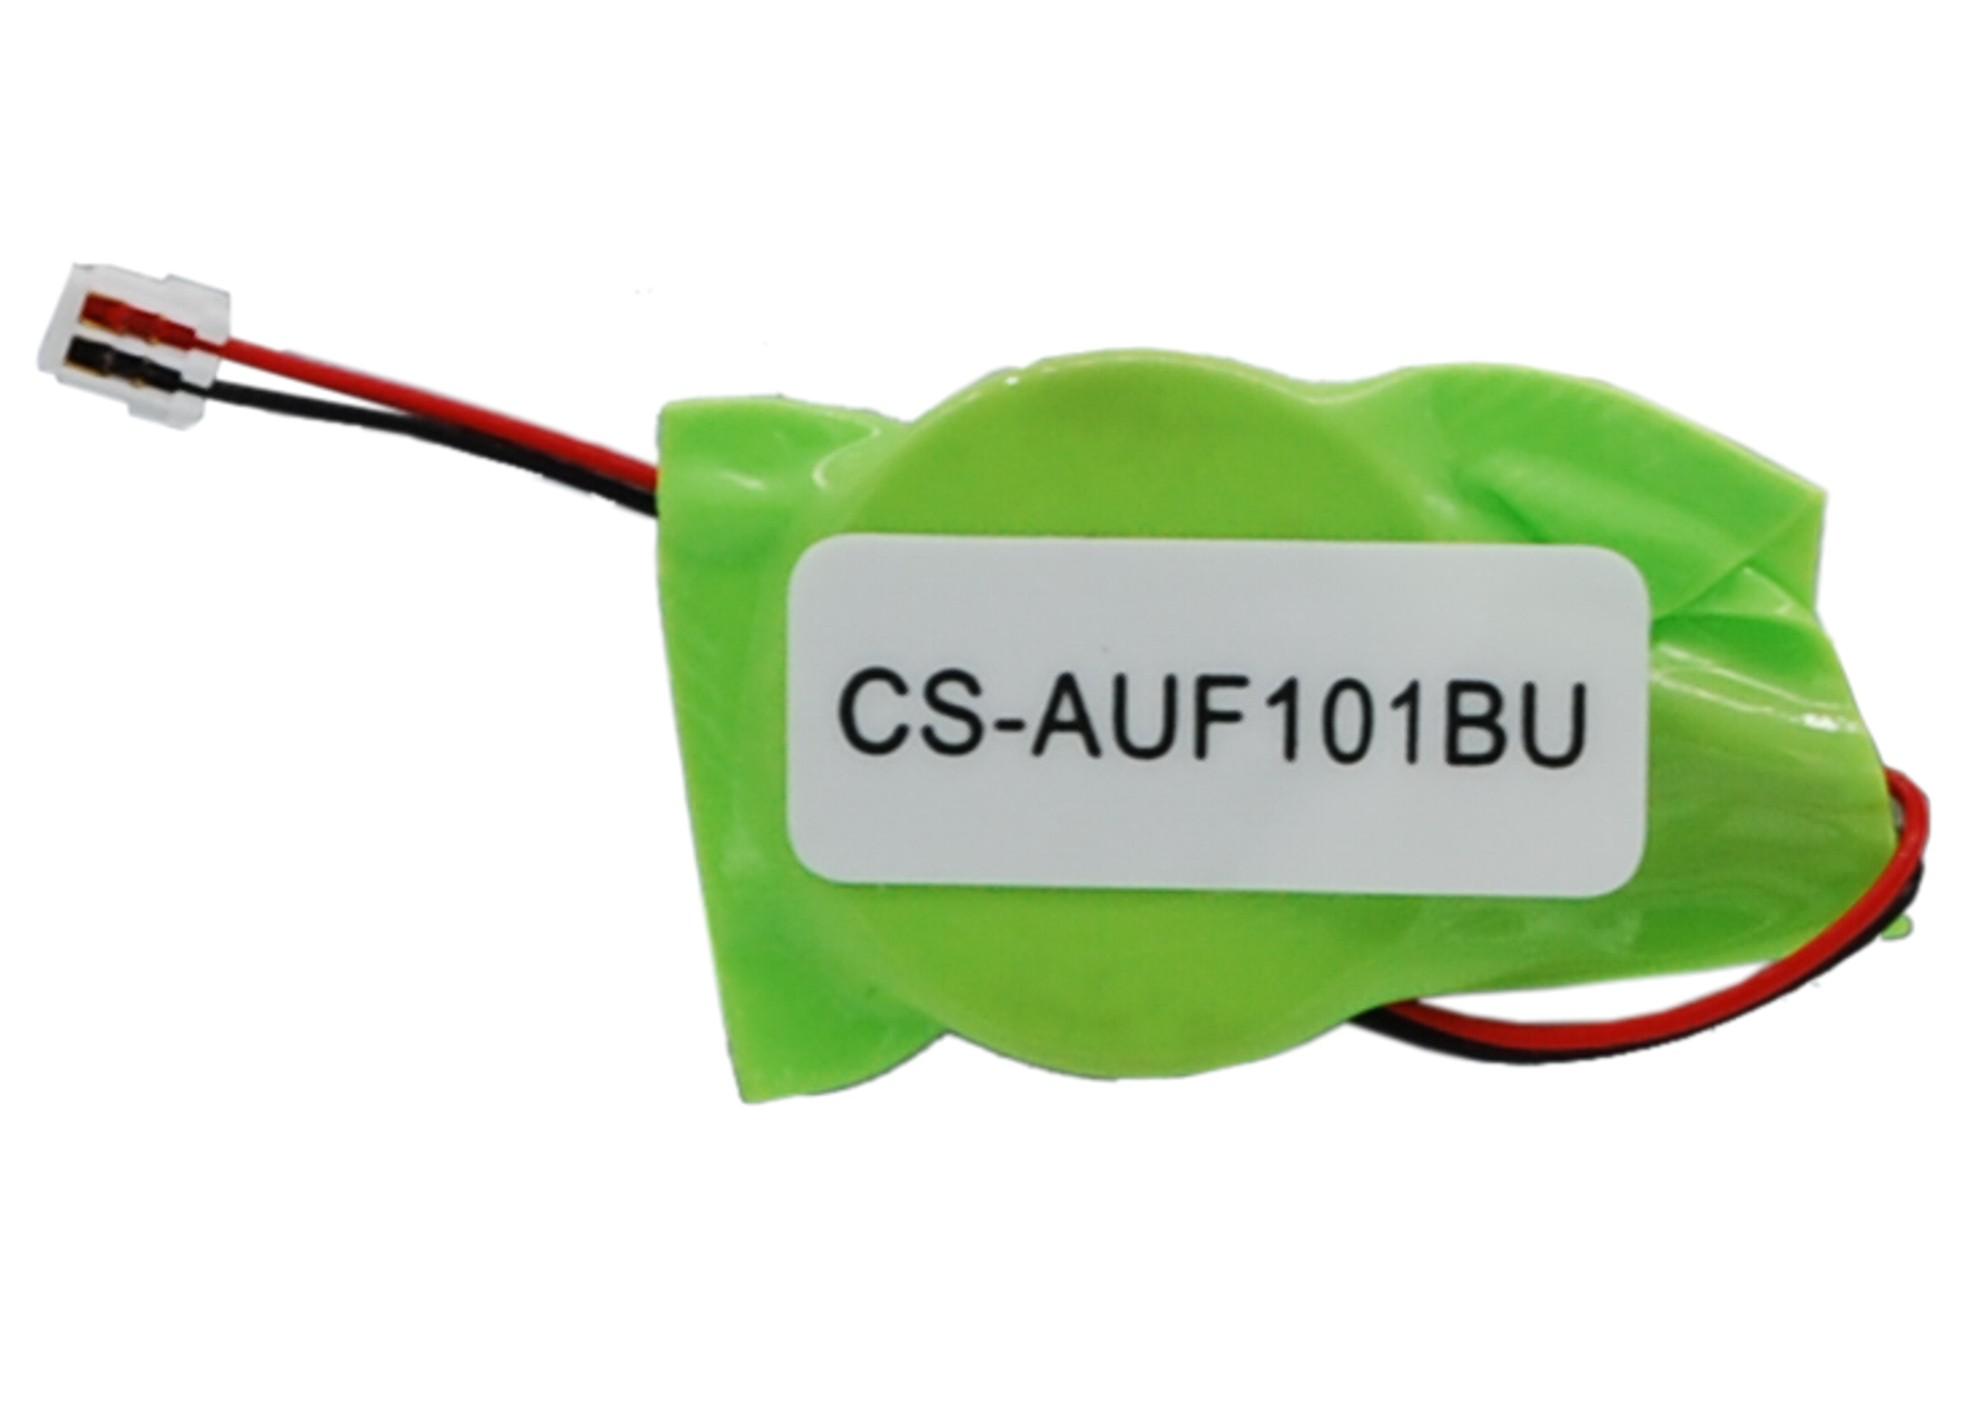 Cameron Sino baterie cmos pro ASUS Eee Pad Transformer TF101-1B033A 3V Li-ion 40mAh zelená - neoriginální